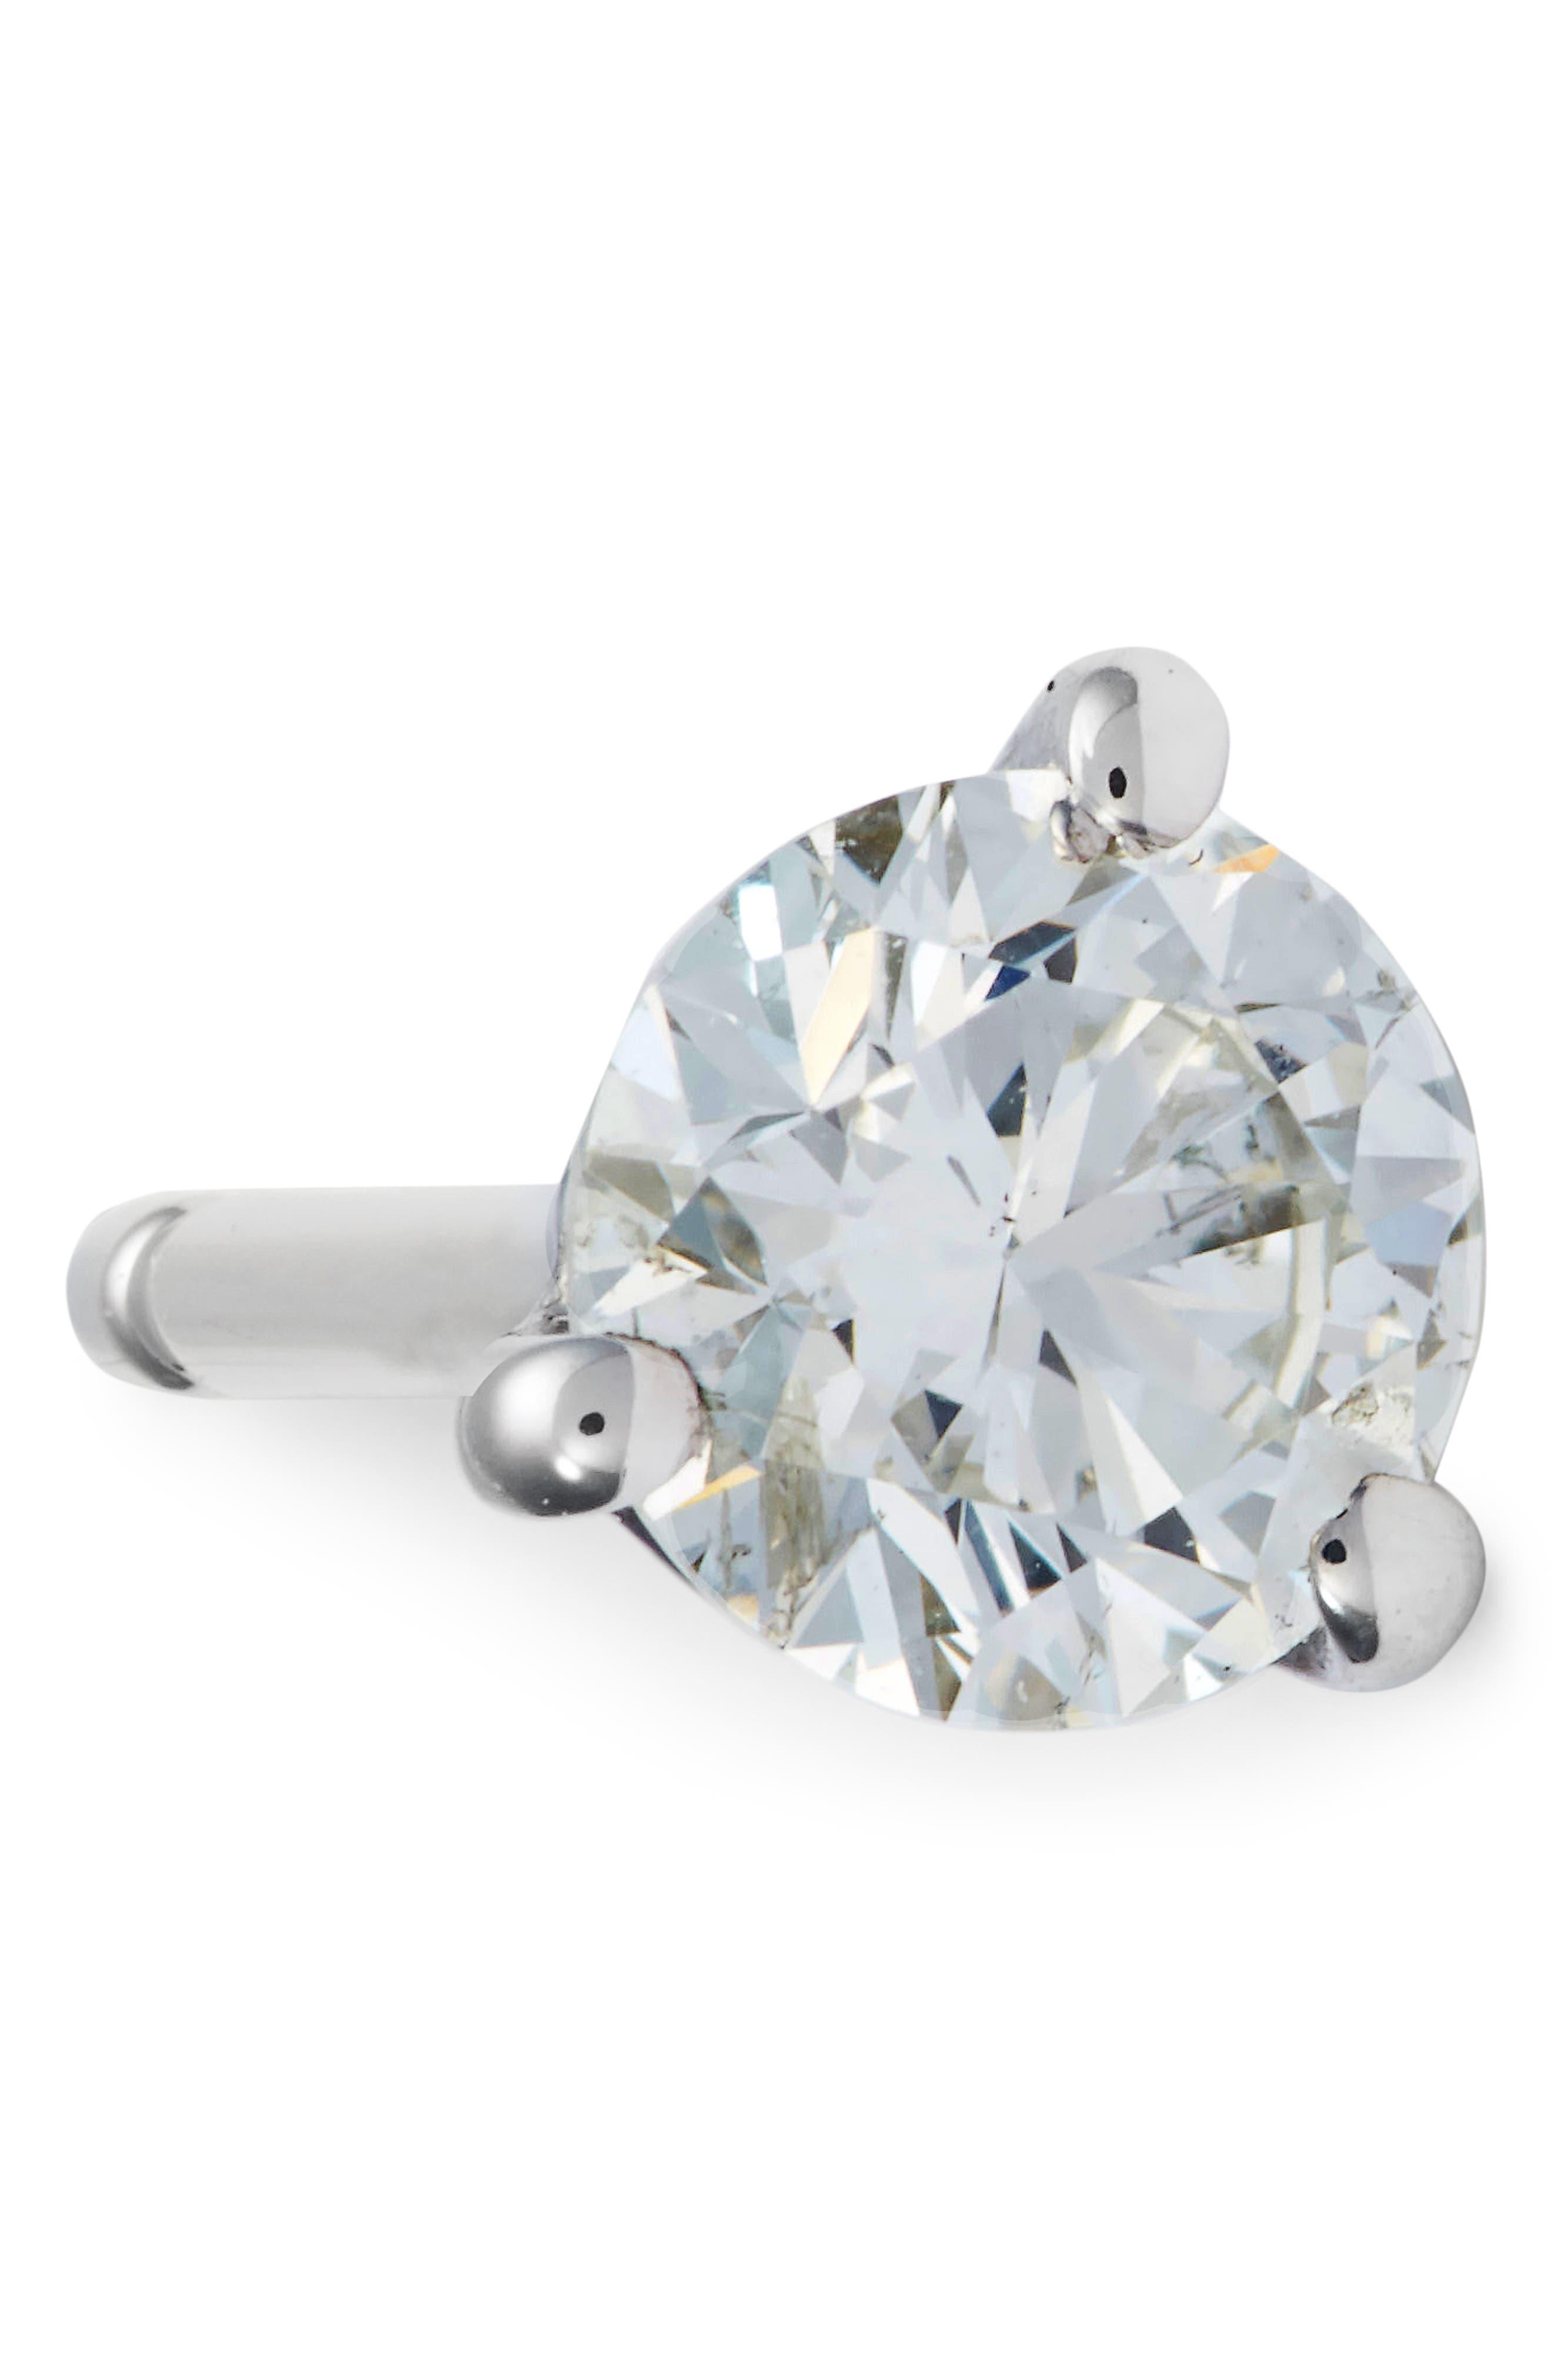 Single Diamond Stud Earring,                             Alternate thumbnail 5, color,                             WHITE GOLD 2